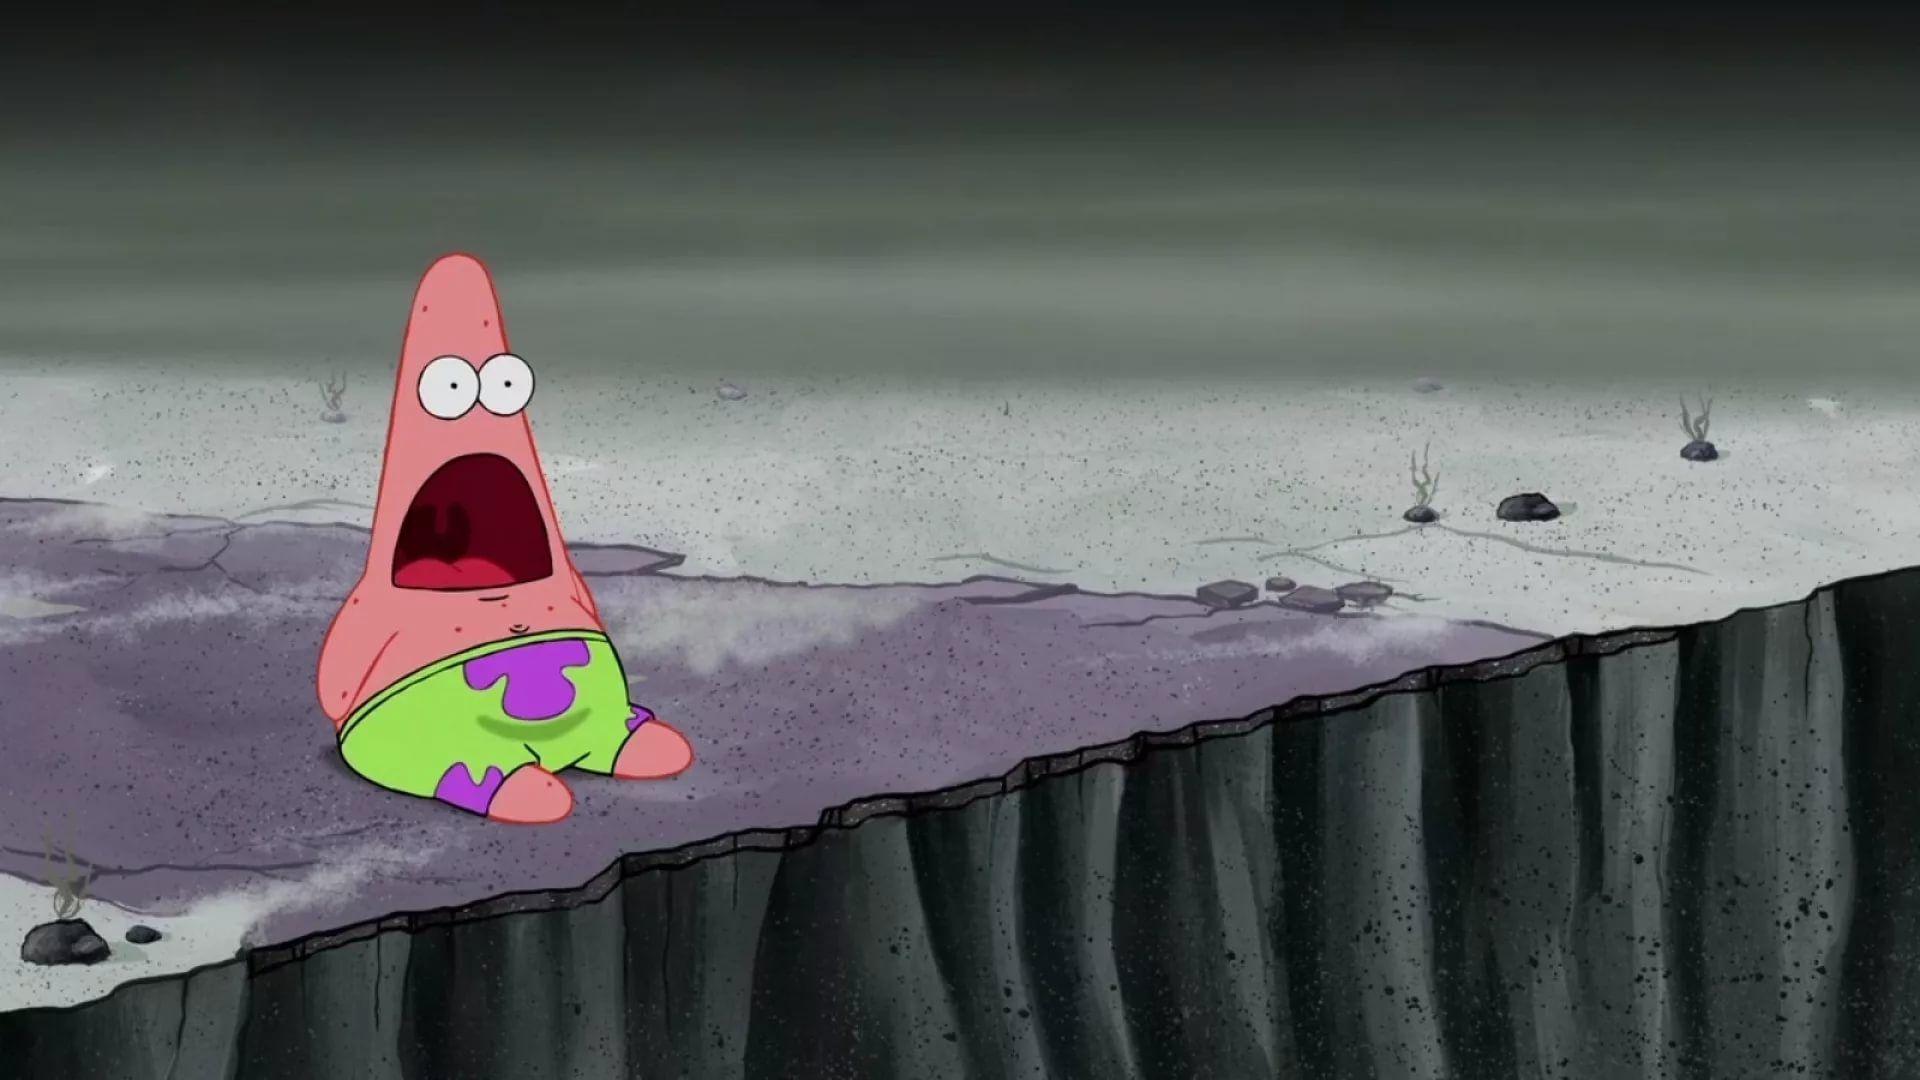 Patrick full hd wallpaper